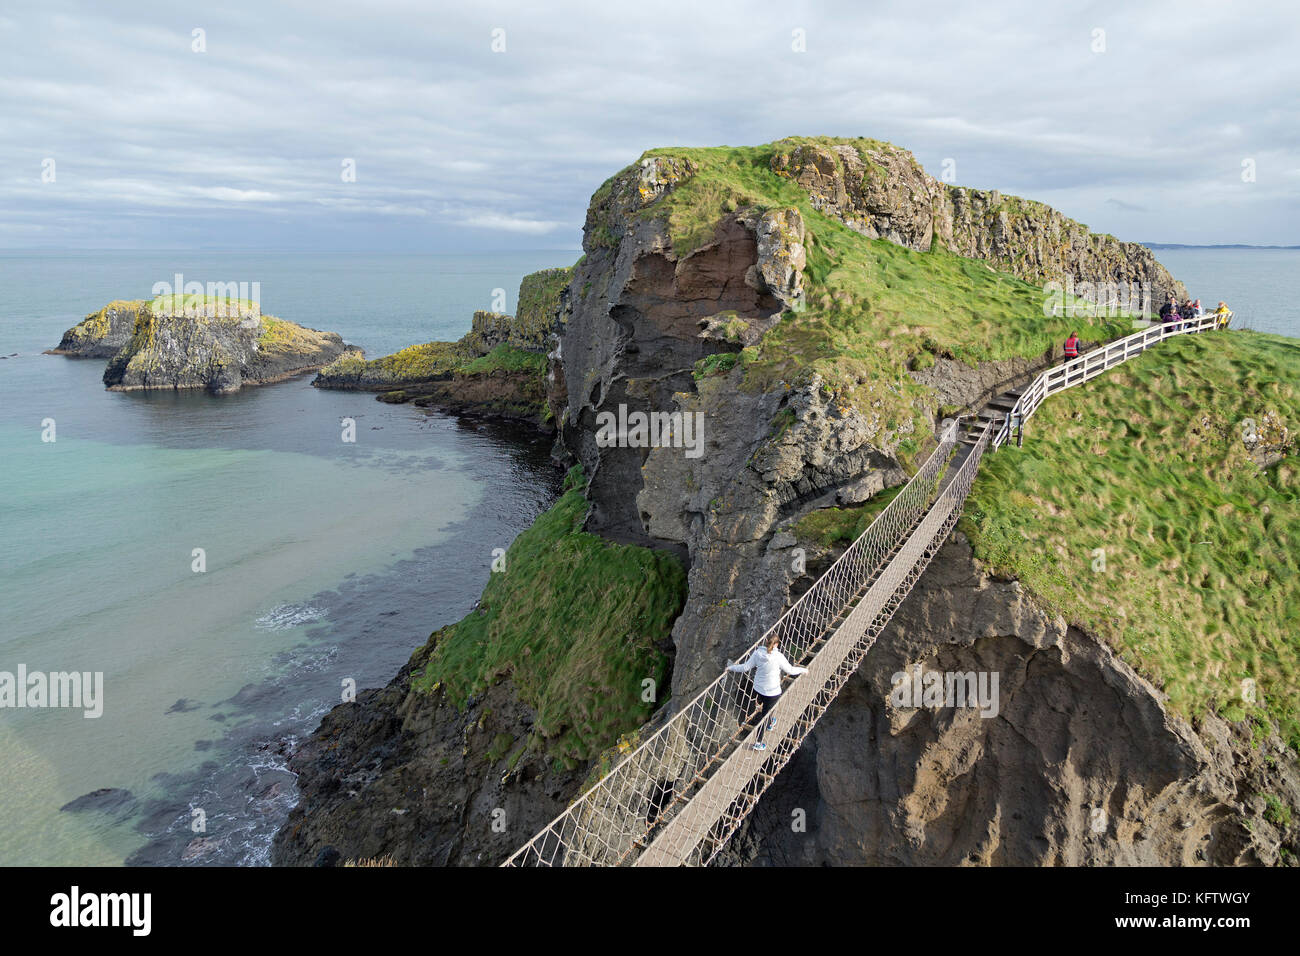 Carrick-a-Rede Rope Bridge, Ballintoy, Co. Antrim, Northern Ireland - Stock Image